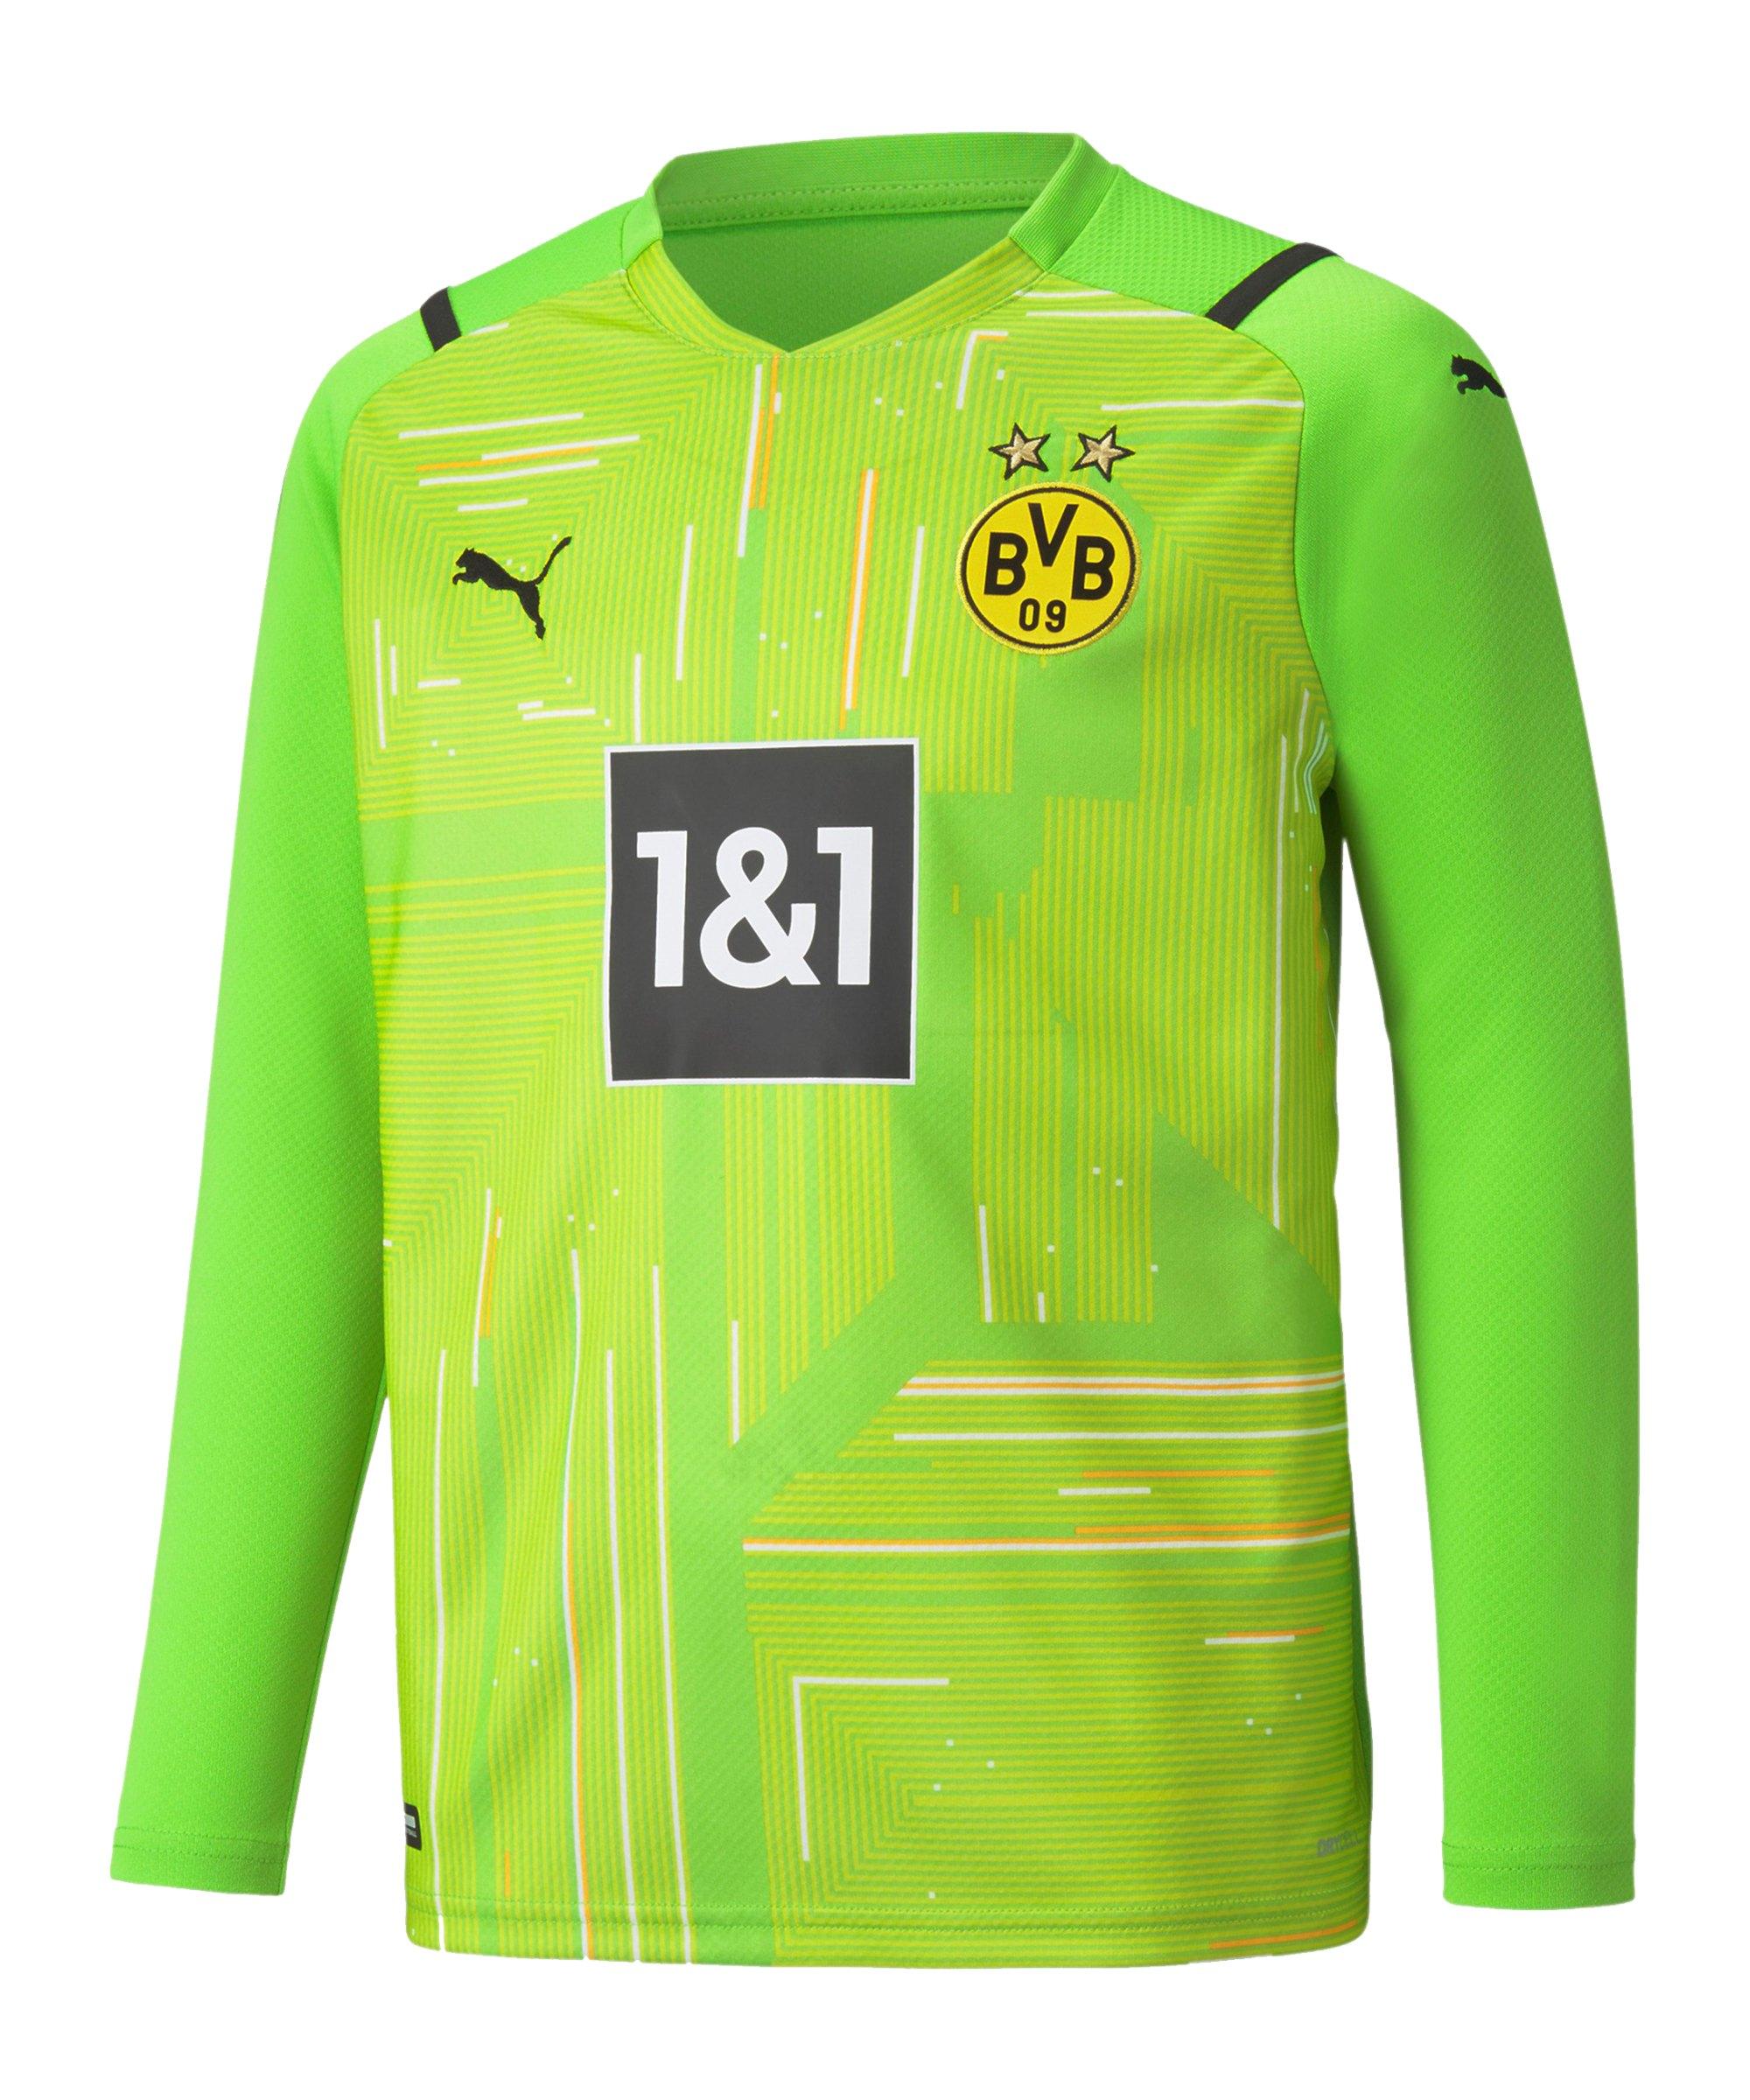 PUMA BVB Dortmund Torwarttrikot 2021/2022 Kids Grün F51 - gruen